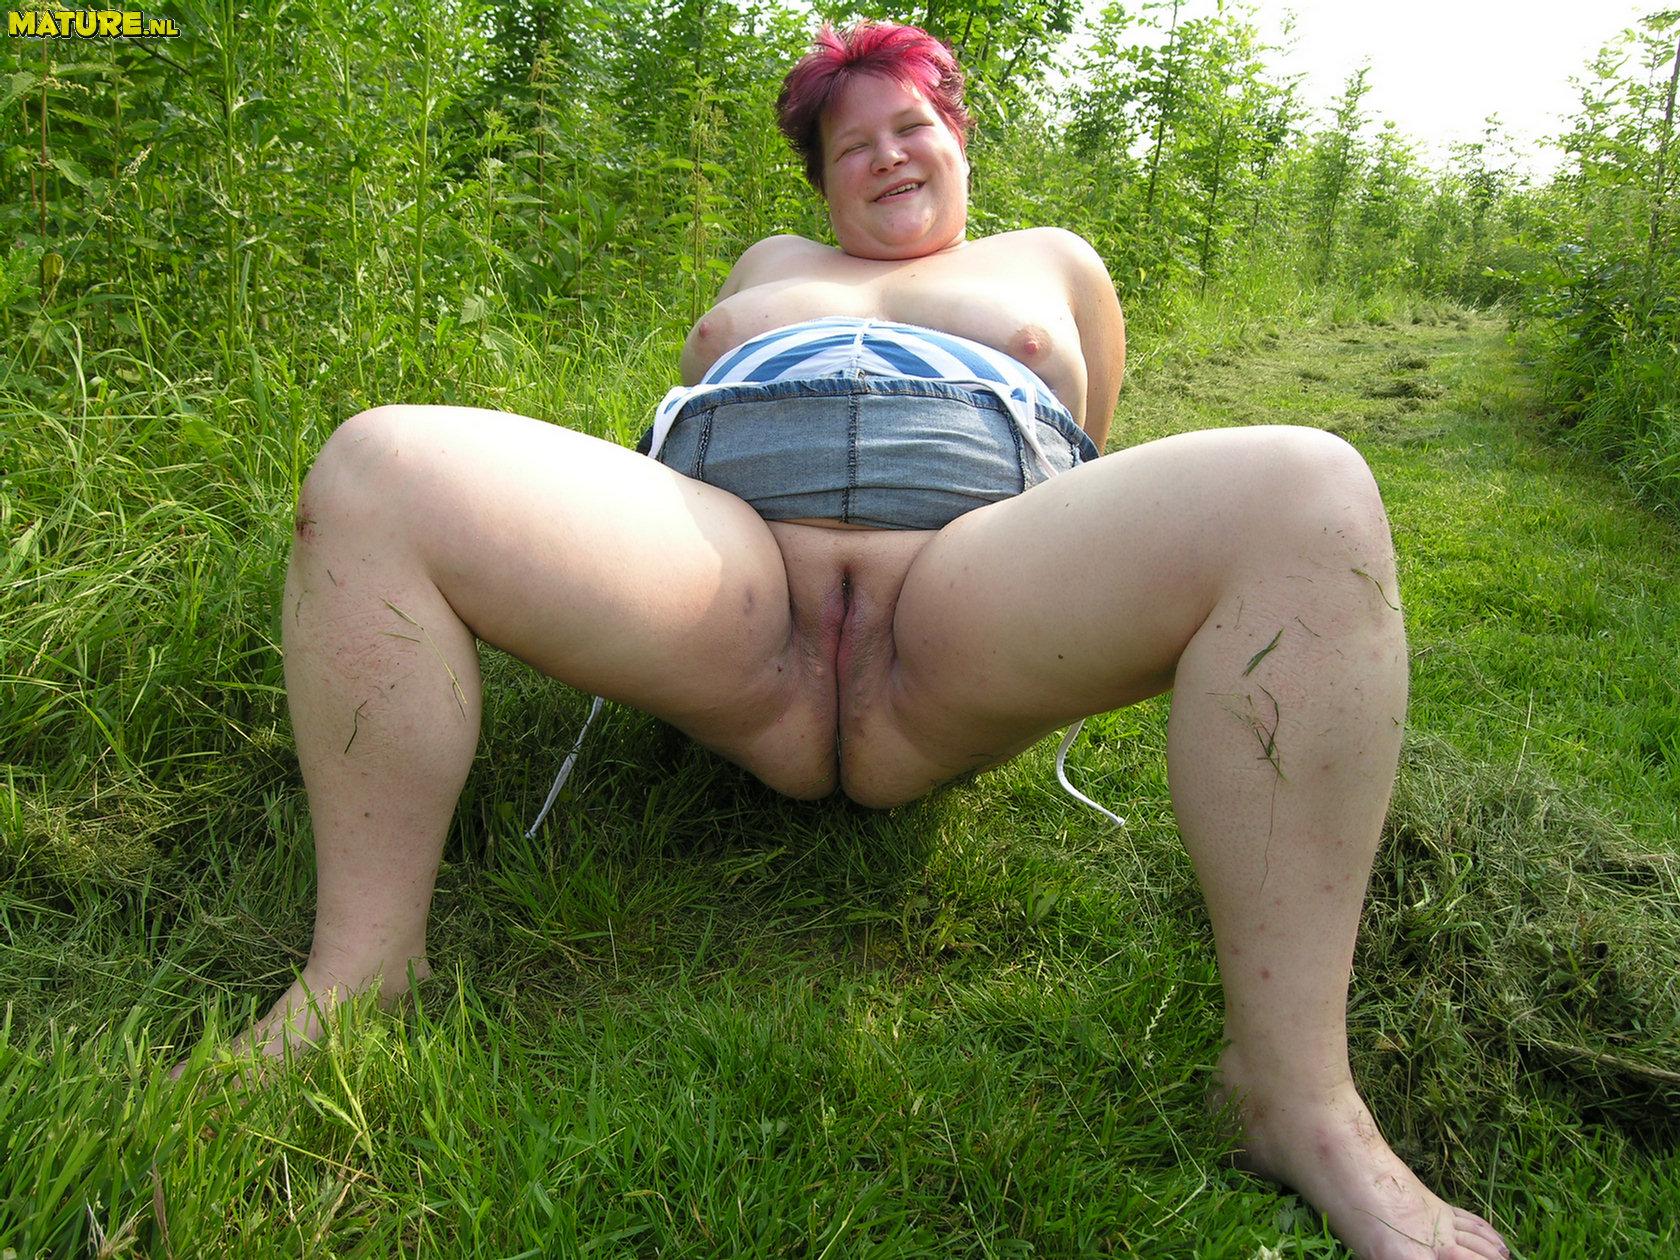 Sex mature 60 xxl